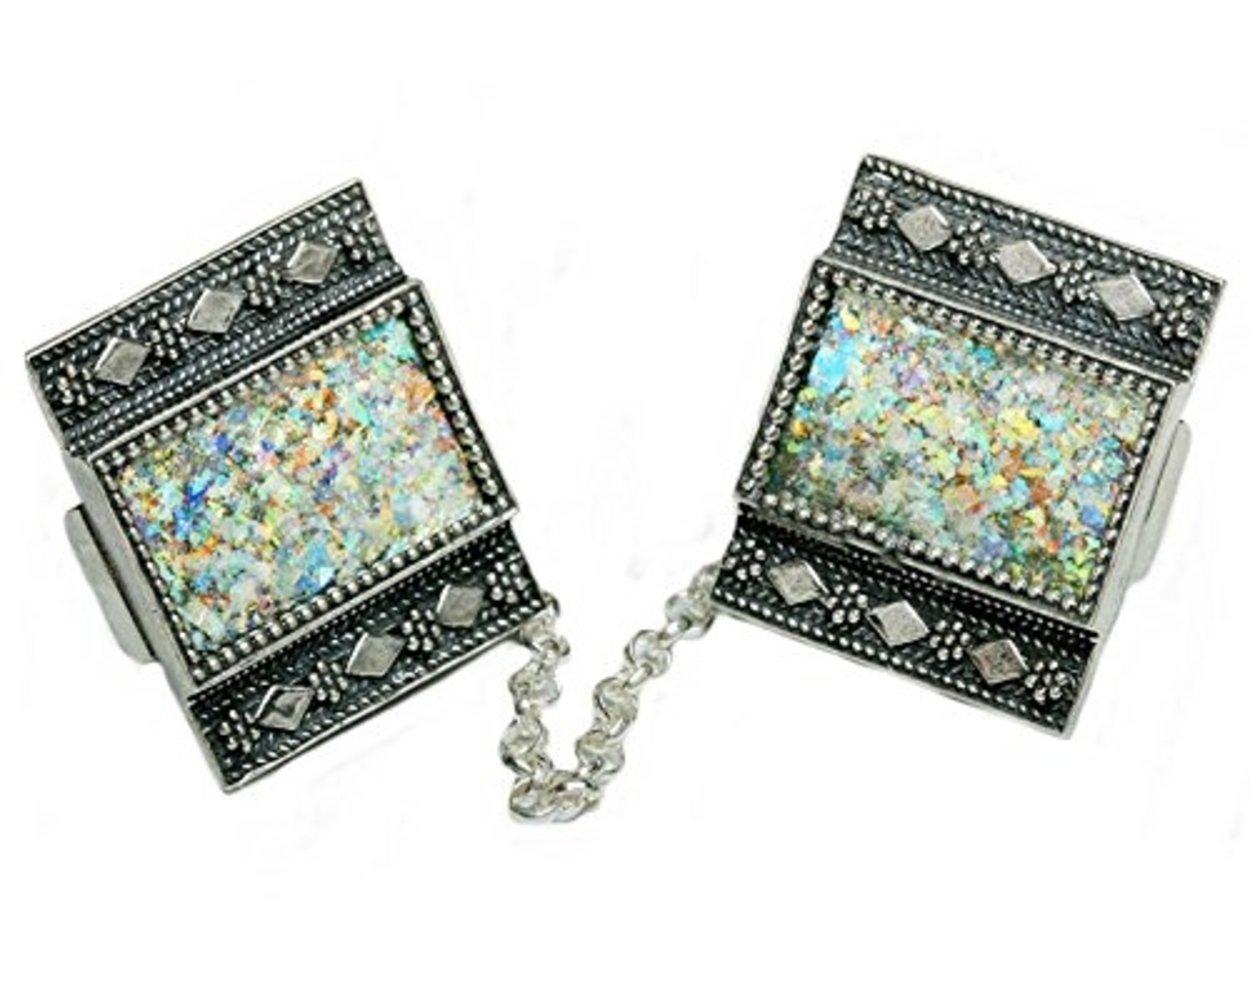 Baltinester Ancient Roman Glass Prayer Shawl Clip With Yemenite Jewelry Design